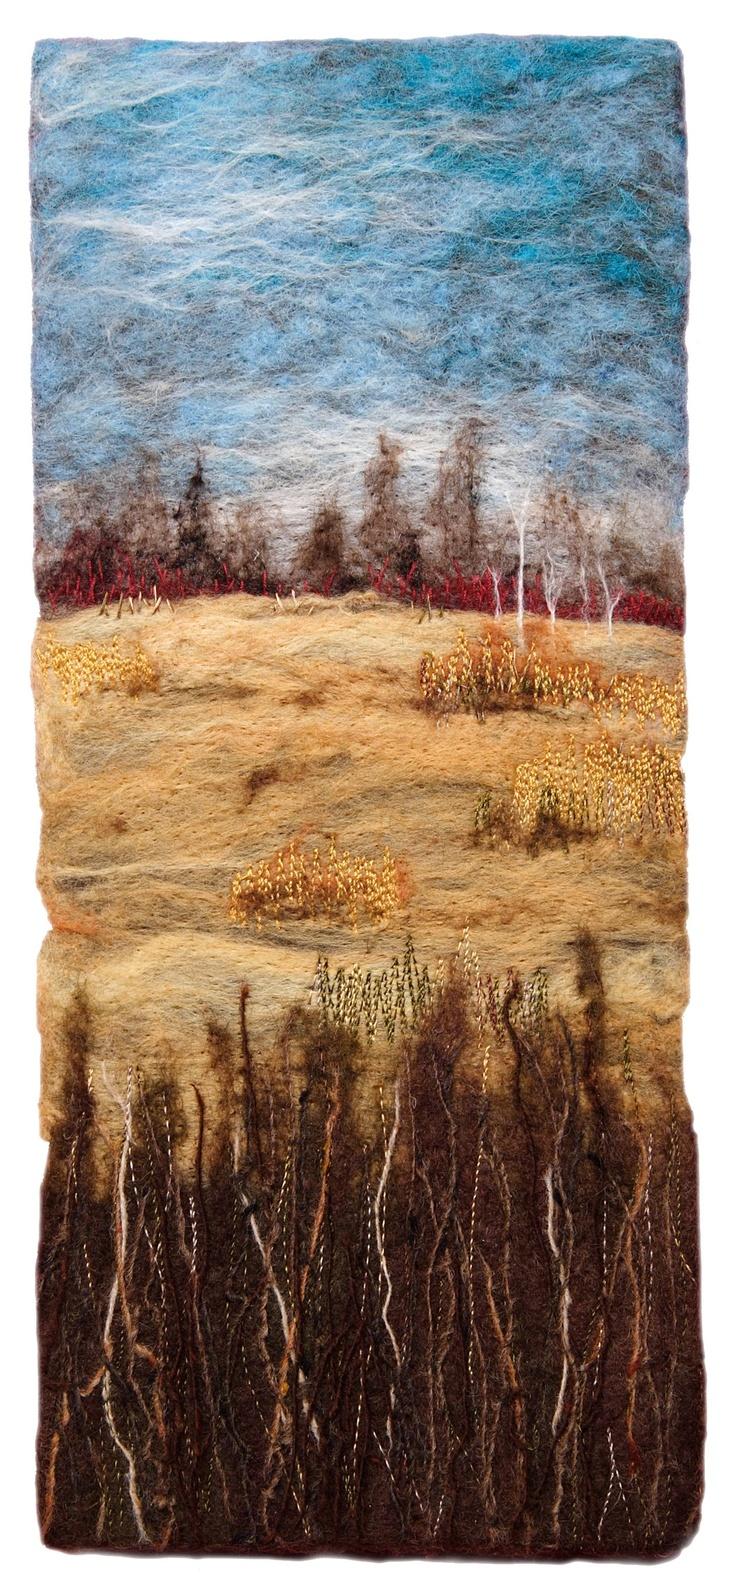 'Jemseg Dogwood' by Alison Murphy. Wool and thread.